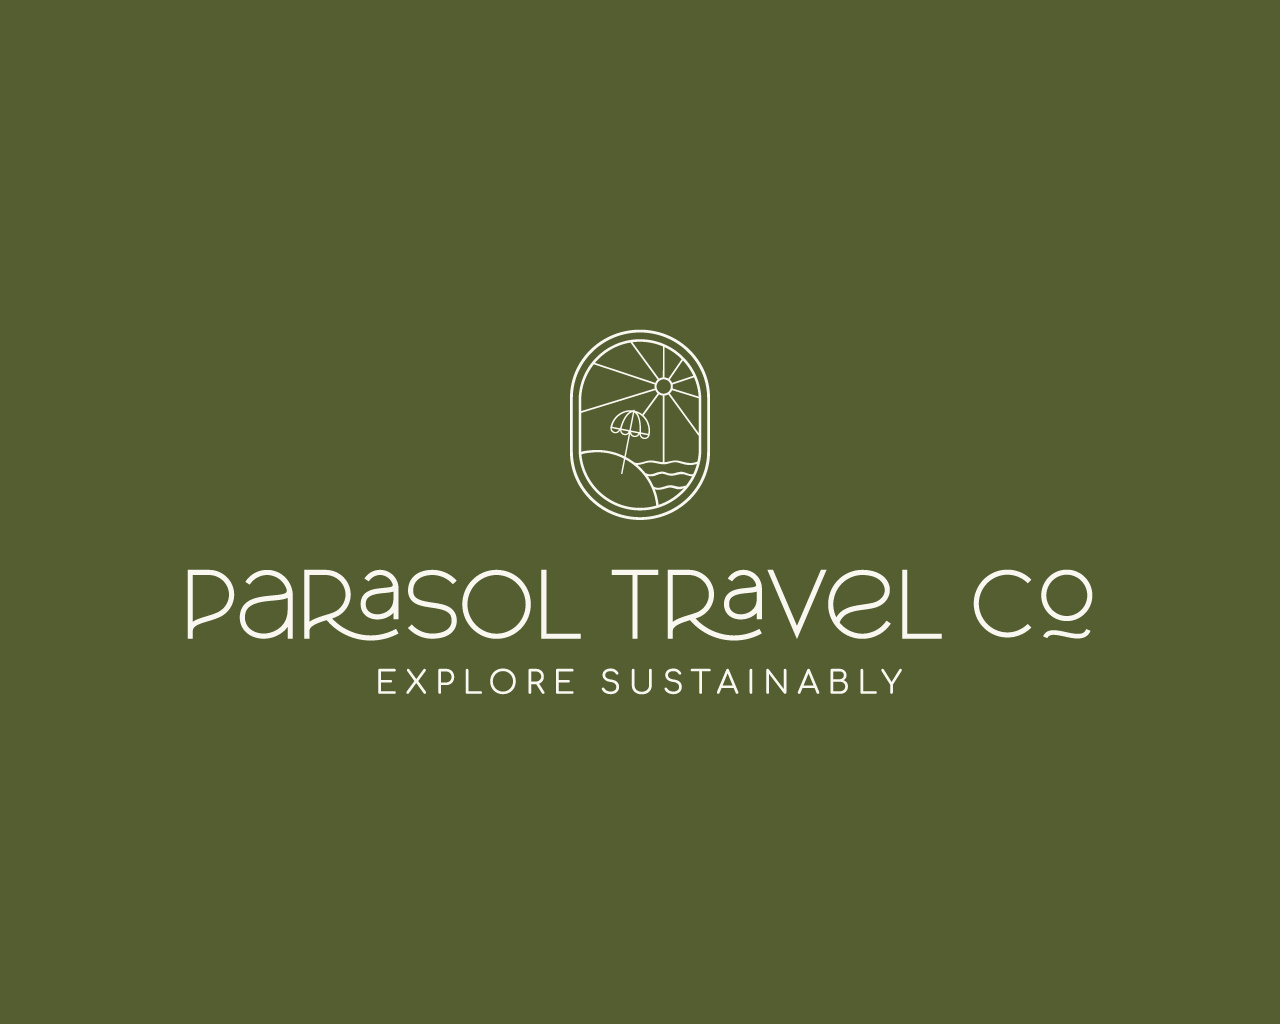 Parasol Travel Co Travel Agency Logo